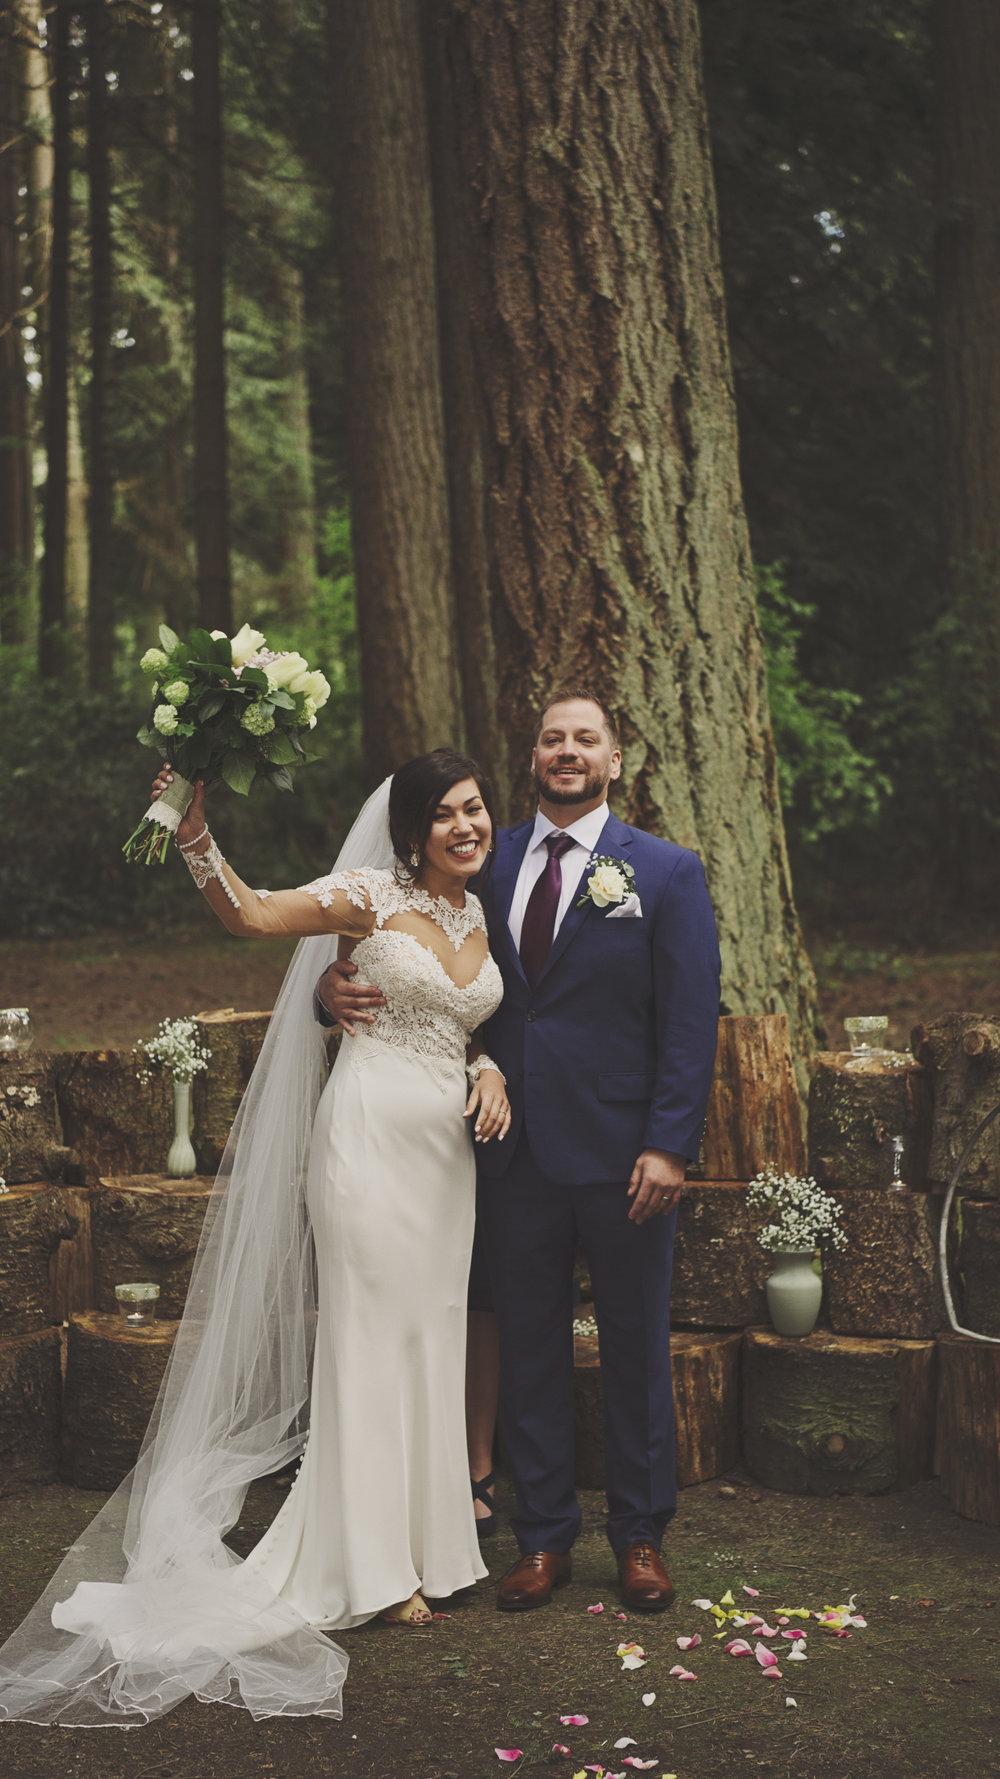 Woodsy Wedding_Kitsap Memorial State Park_Kelsey Lane Photography_3